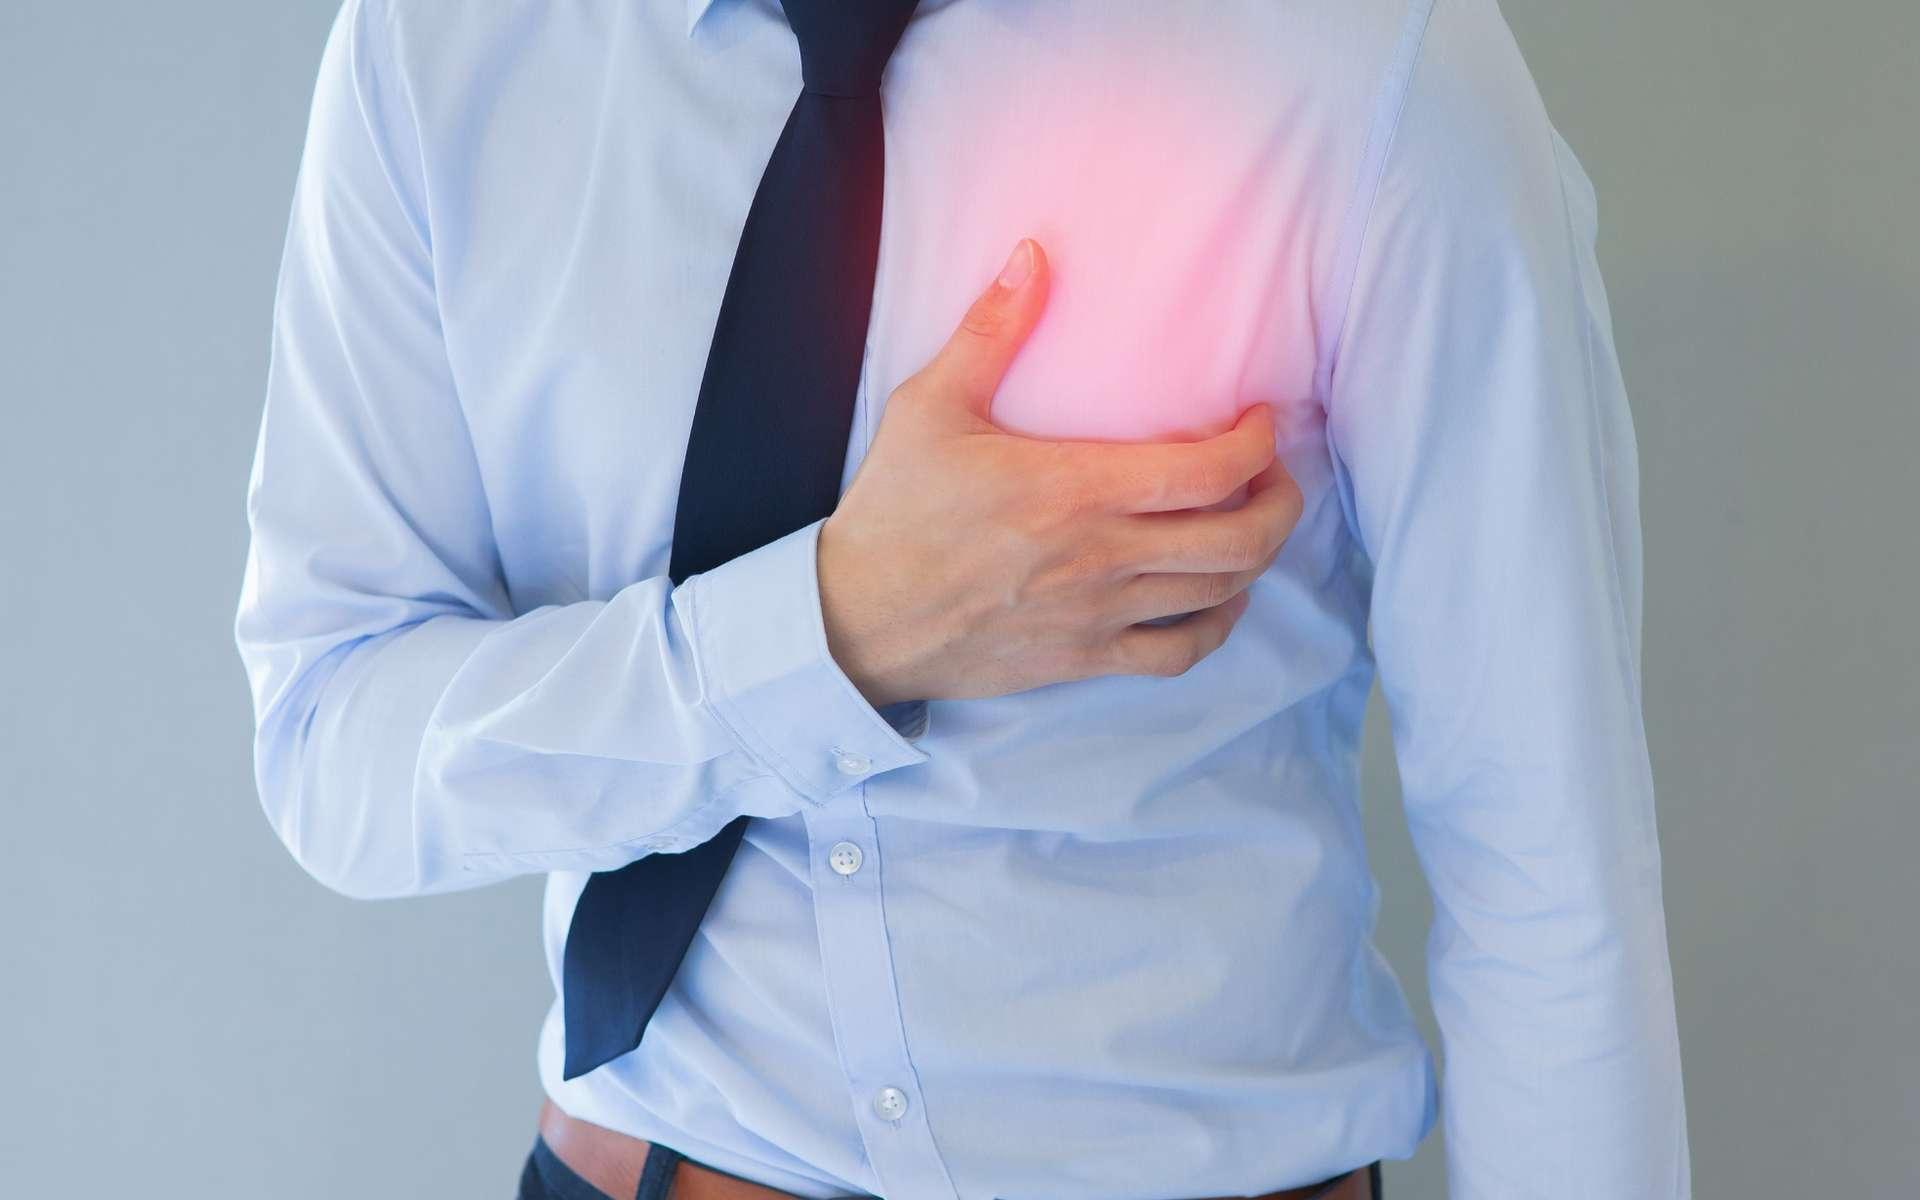 L'infarctus du myocarde (ou crise cardiaque) relève de l'urgence médicale. © Twinsterphoto, Shutterstock